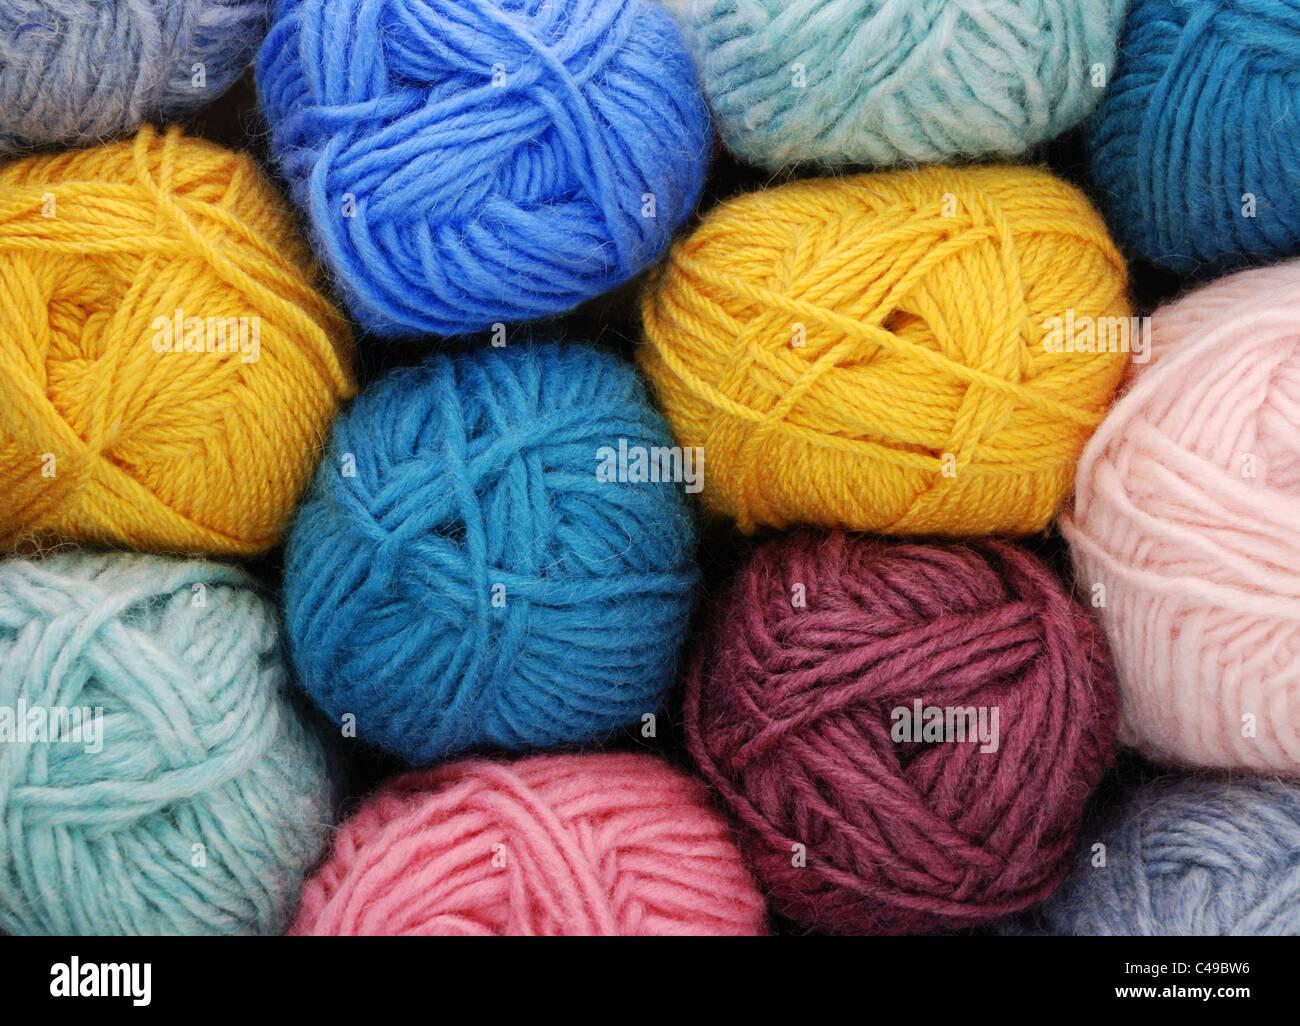 skeins (balls) of wool yarn - Stock Image